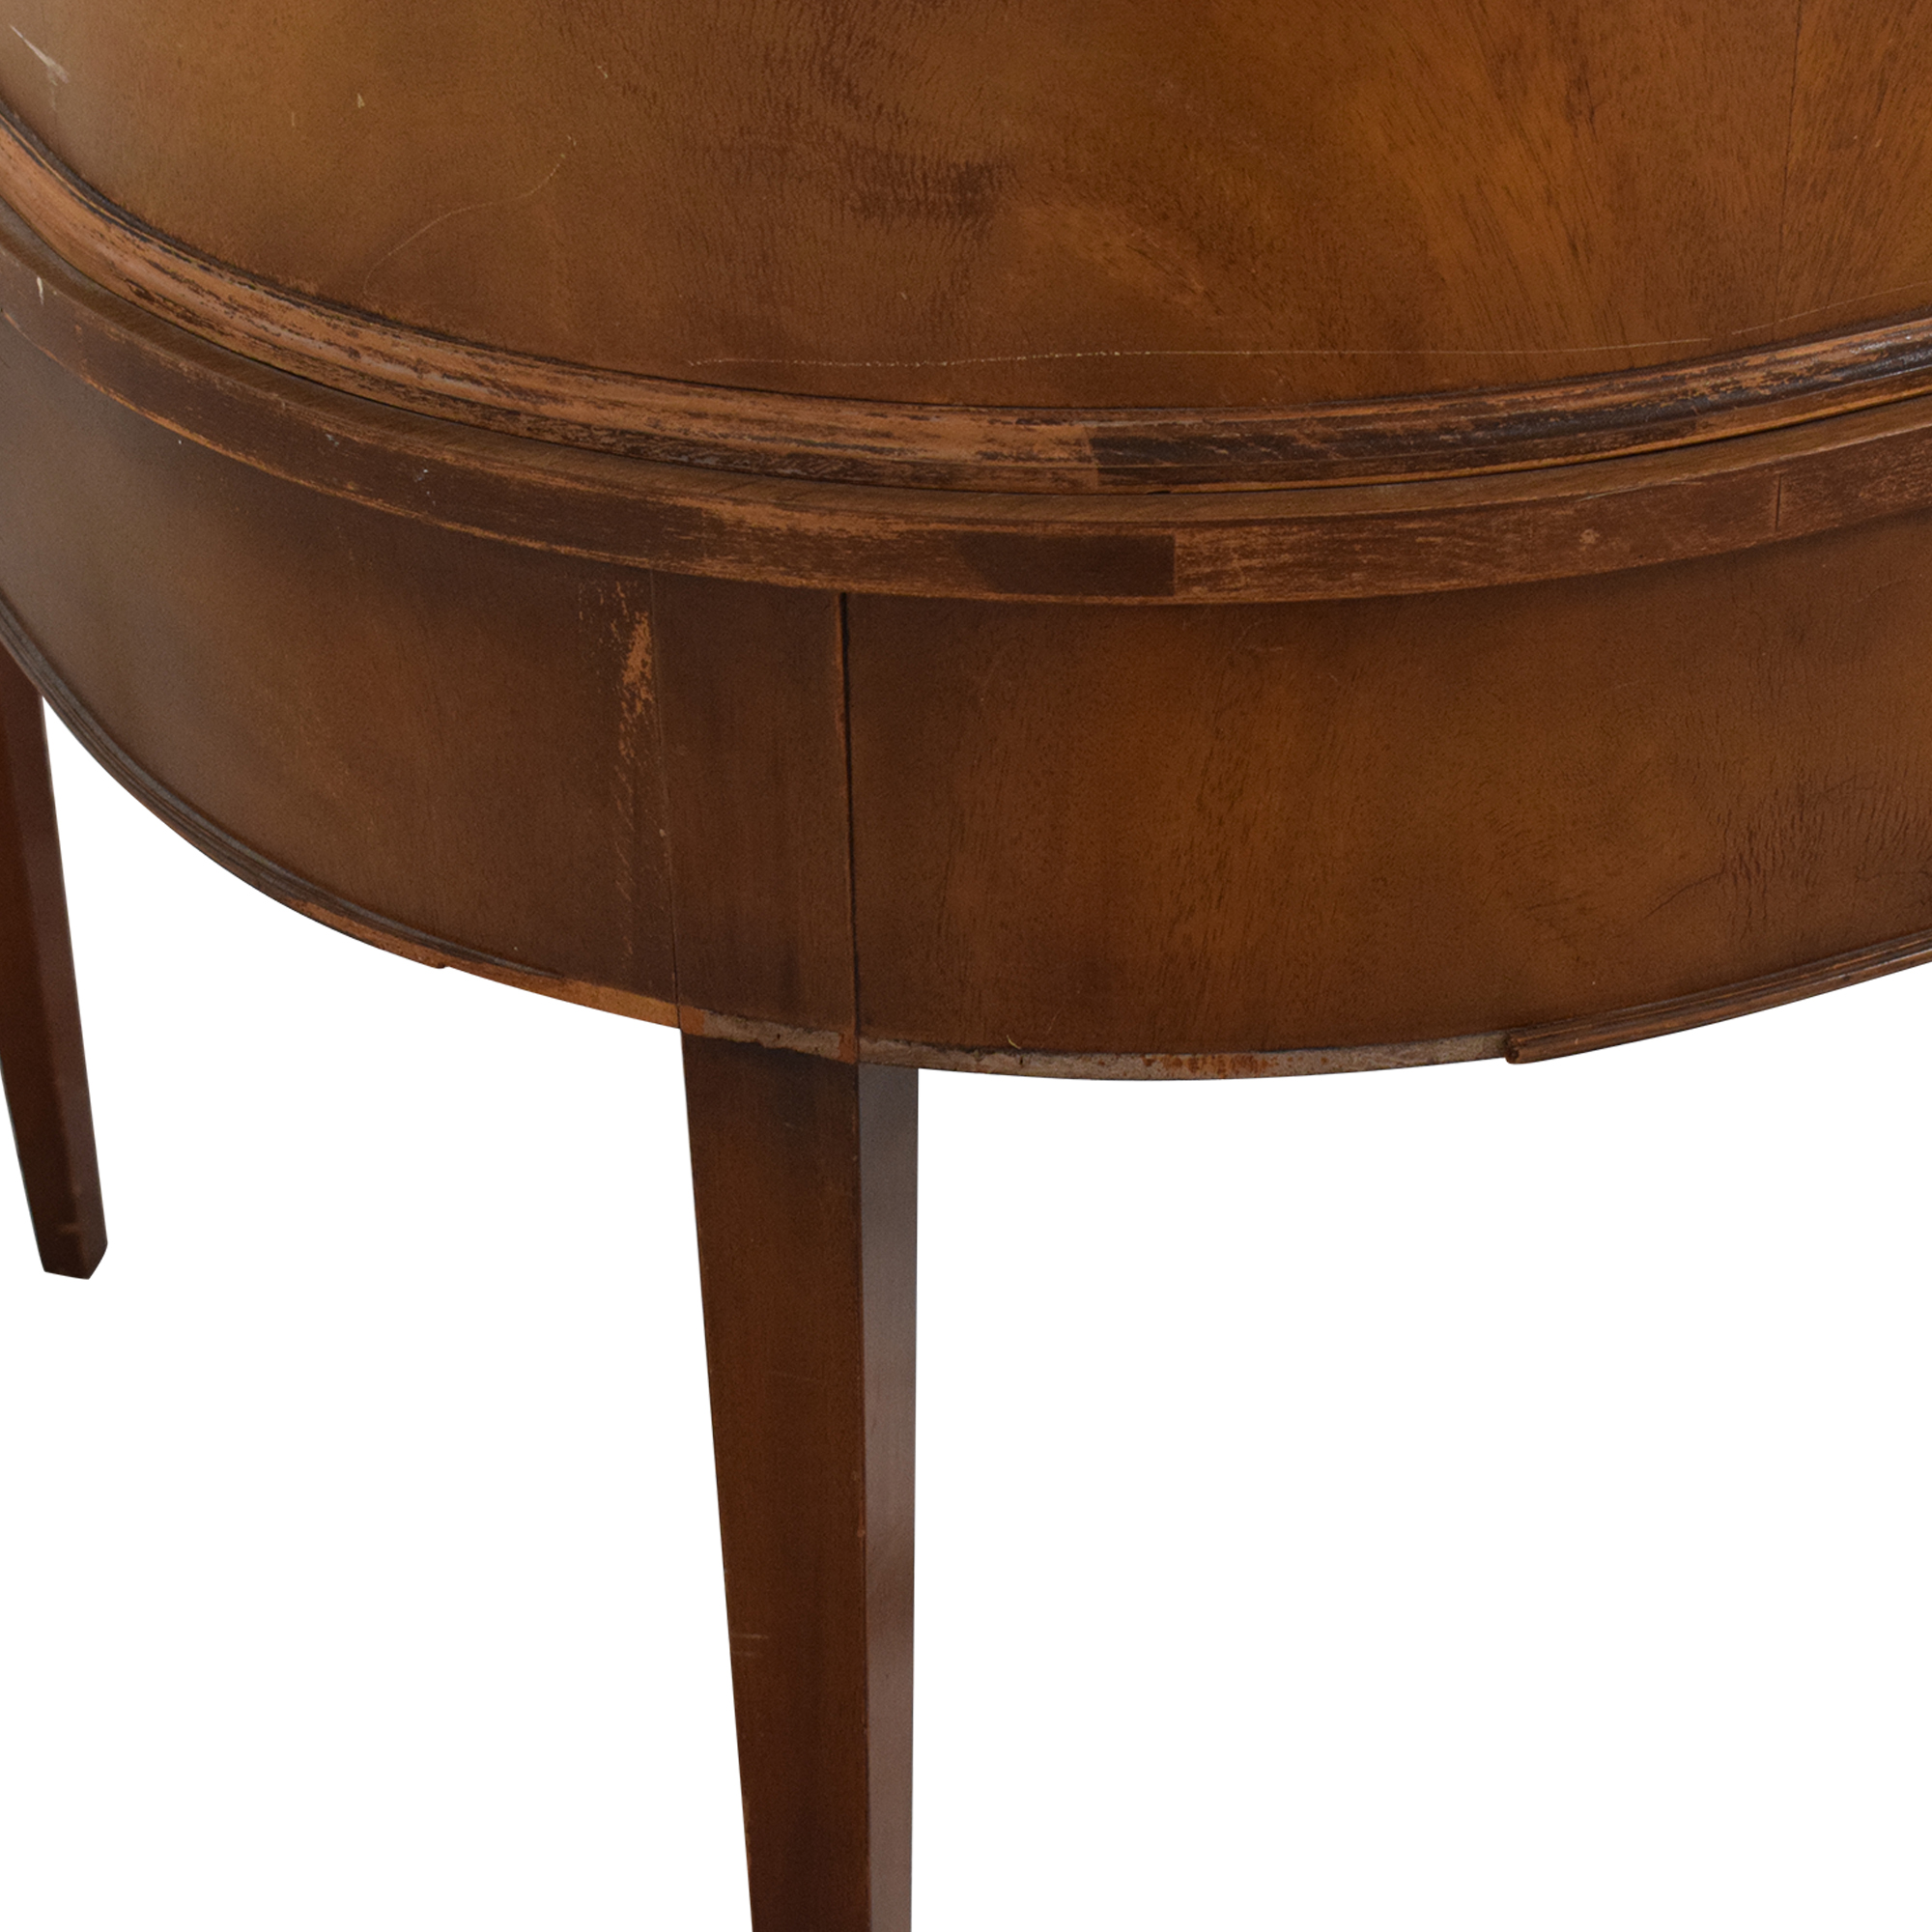 Stiehl Furniture Stiehl Furniture Mahogany Secretary Desk ma